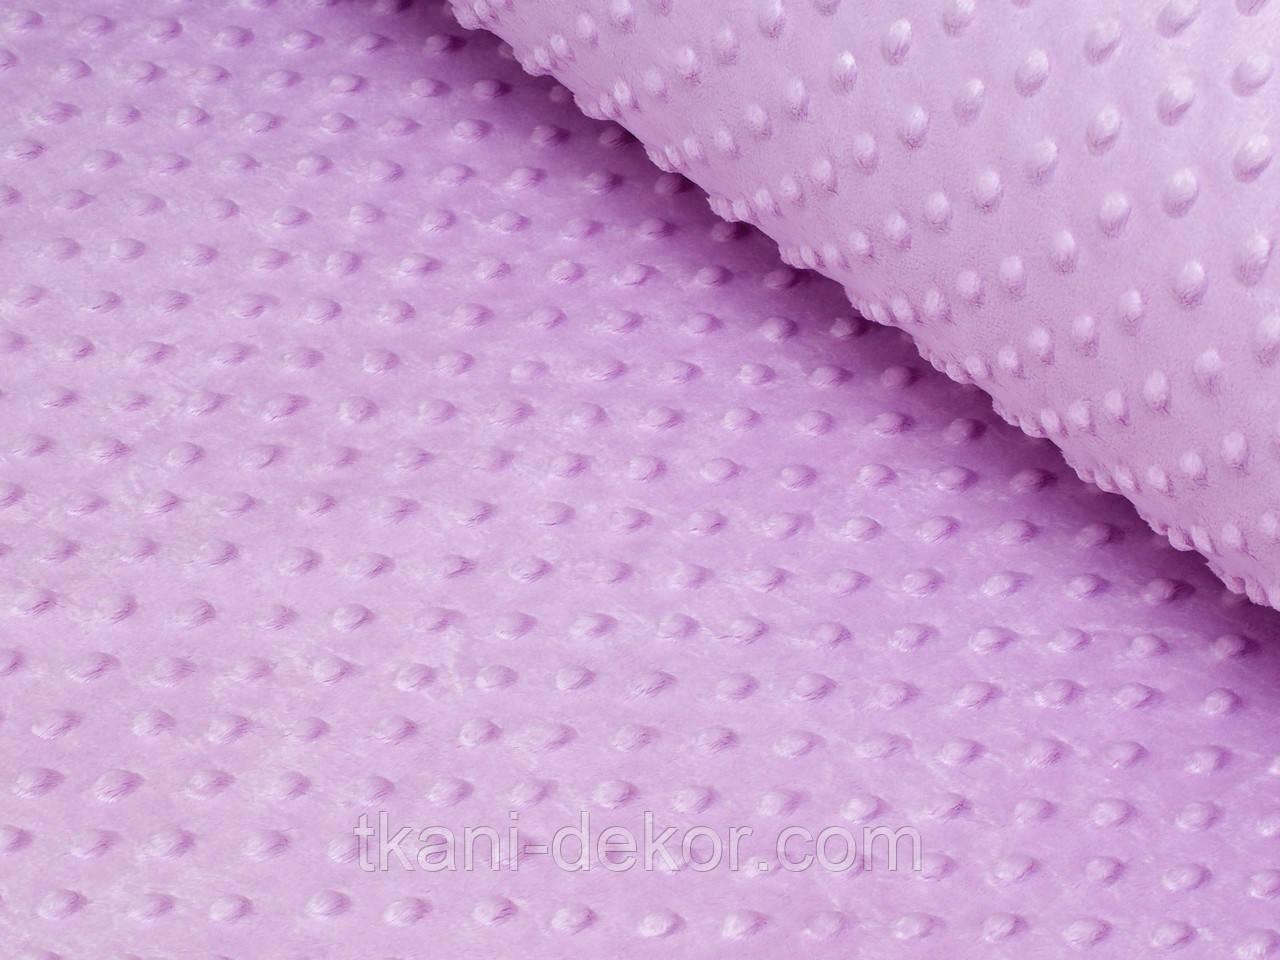 Плюшевая ткань Minky лиловые пупырышки